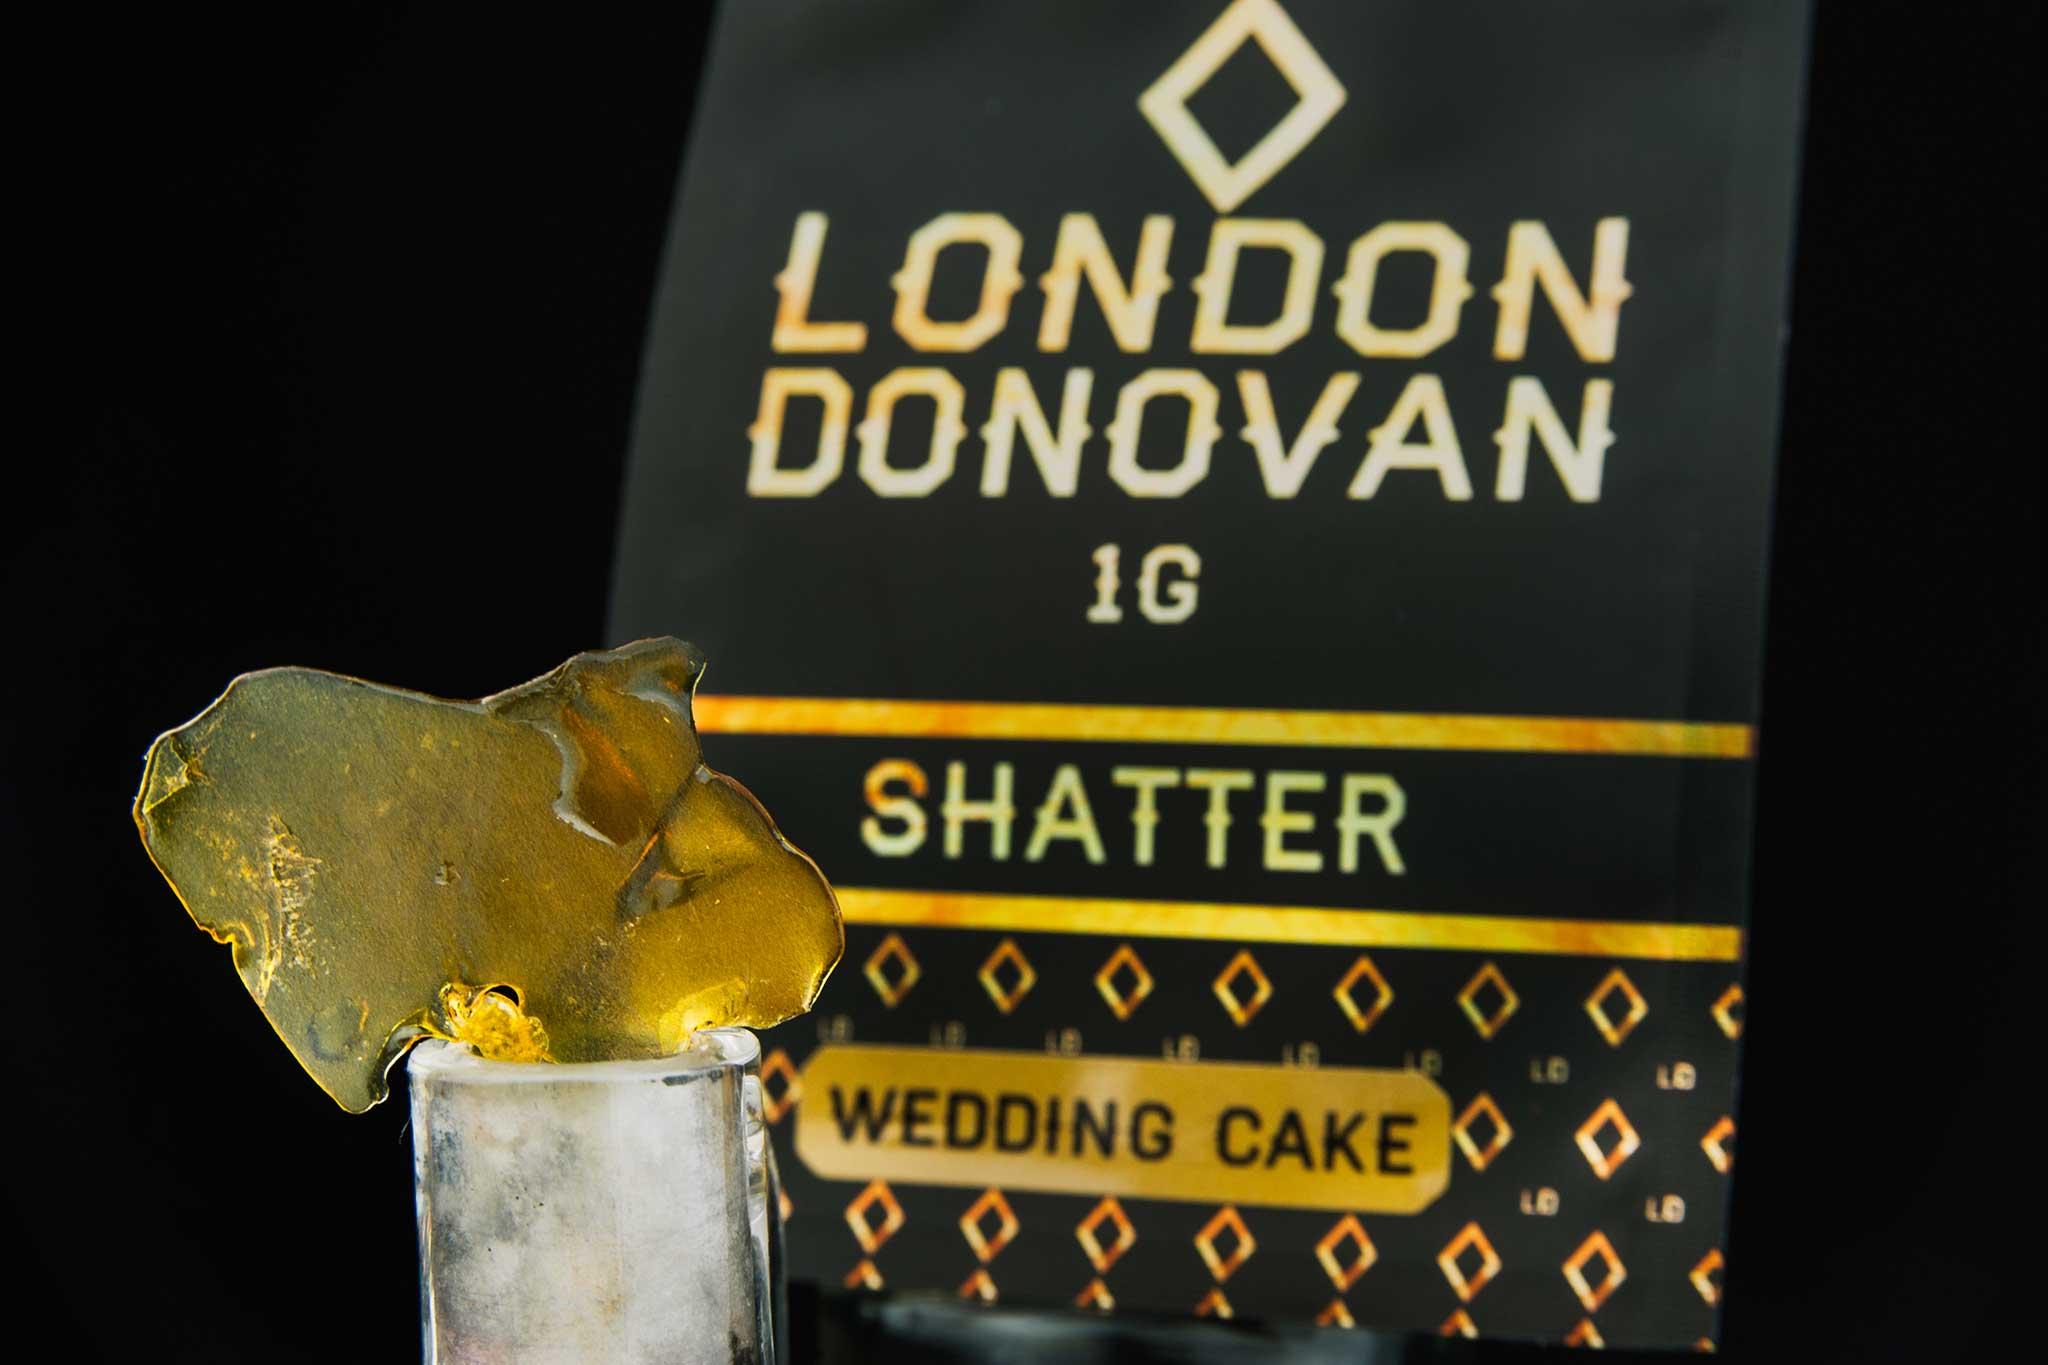 London Donovan Premium Shatter